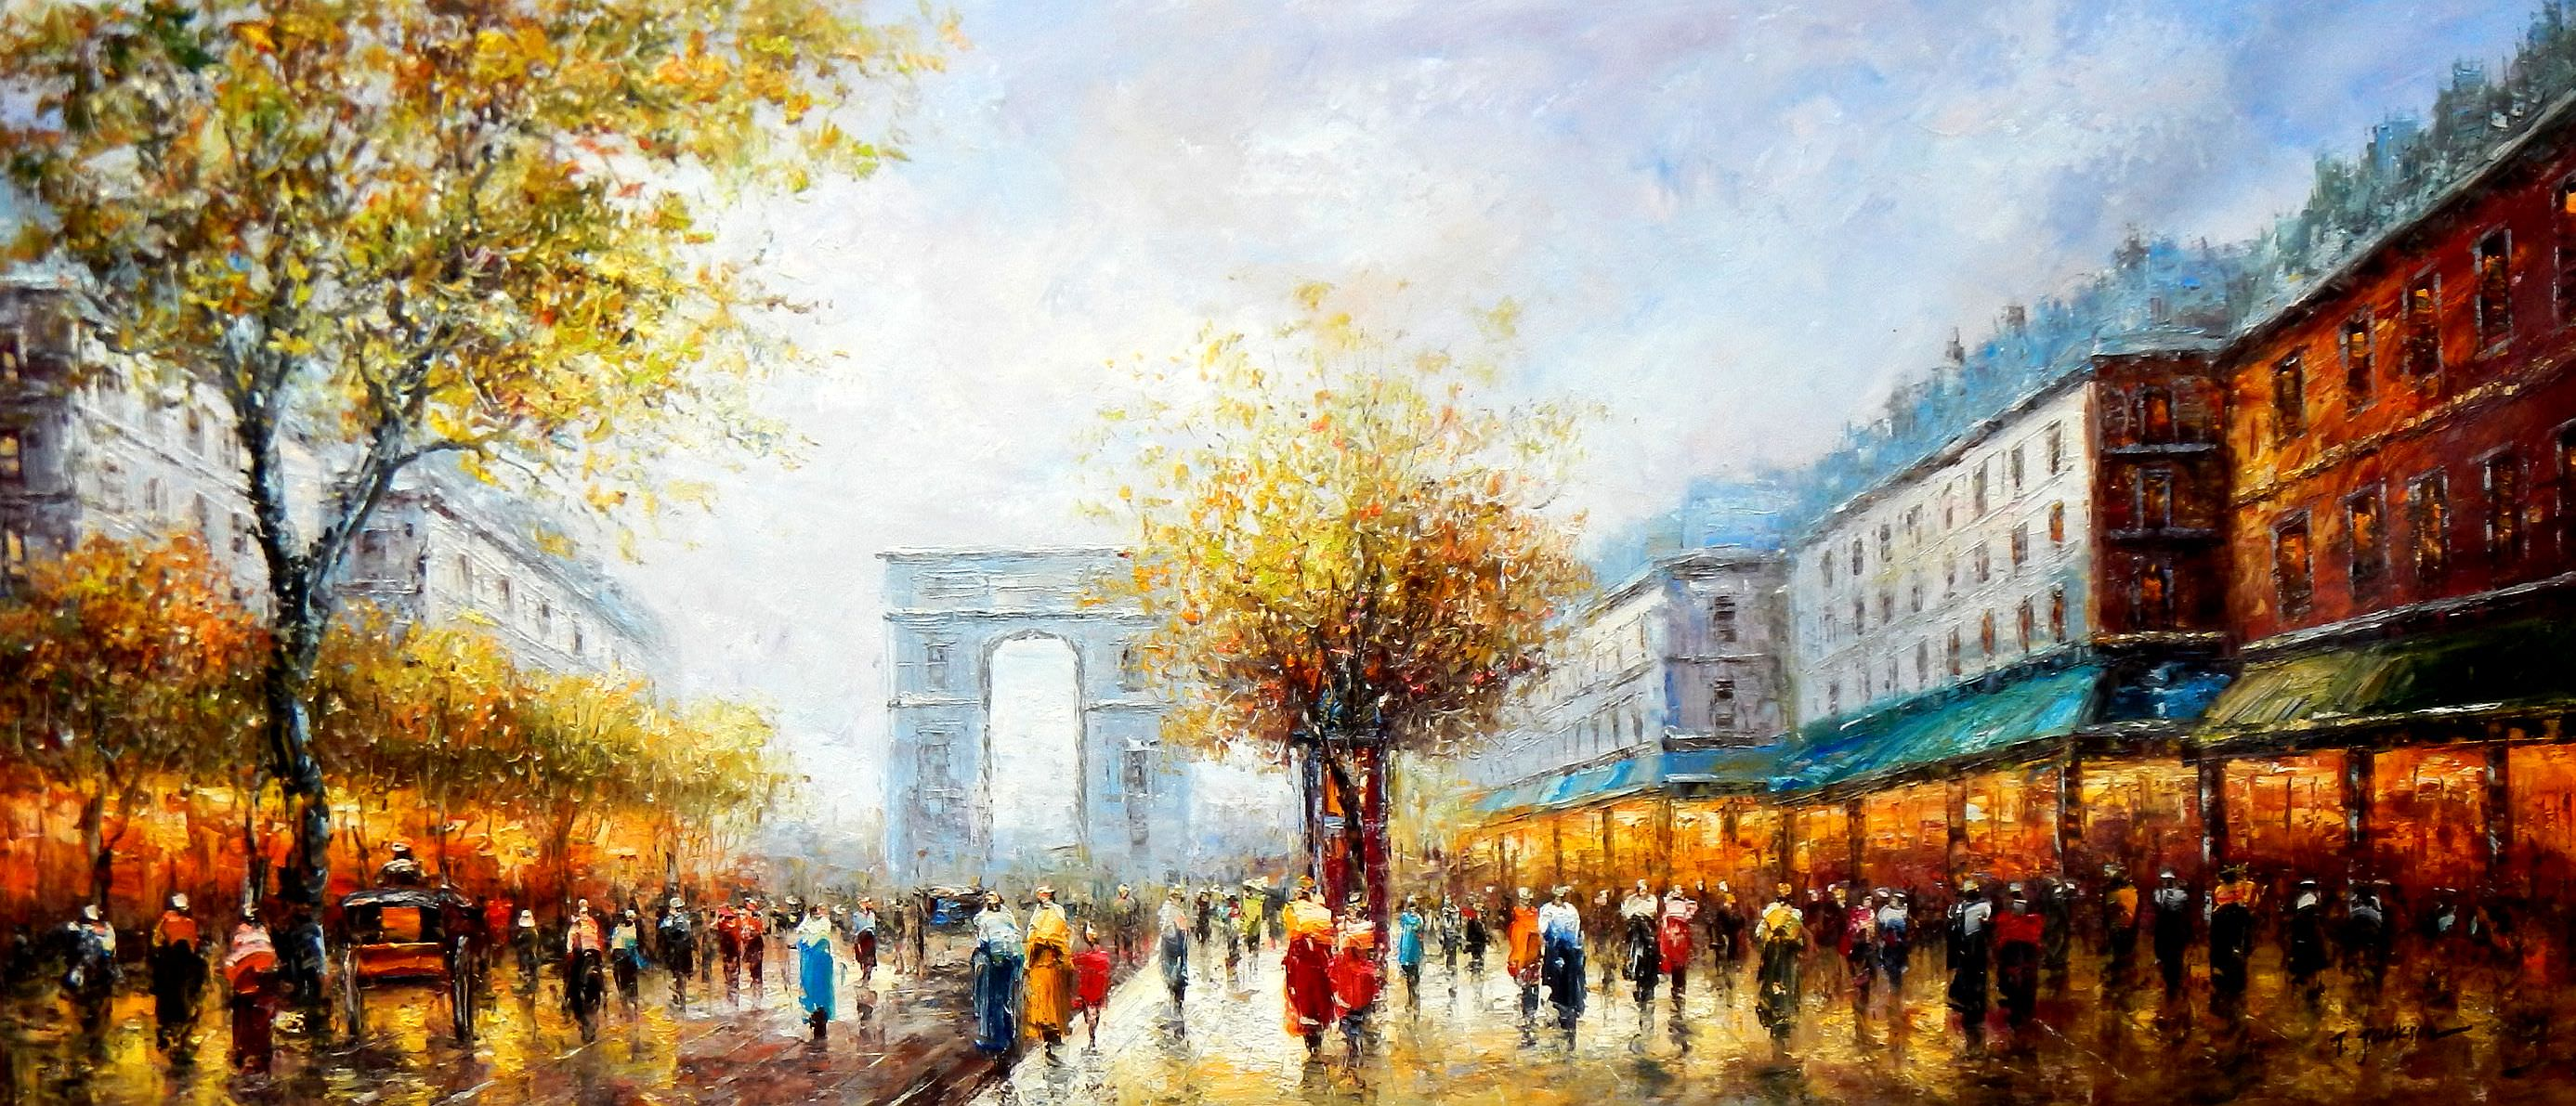 Modern Art - Sommer am Arc de Triomphe Paris t92803 75x180cm Ölbild handgemalt